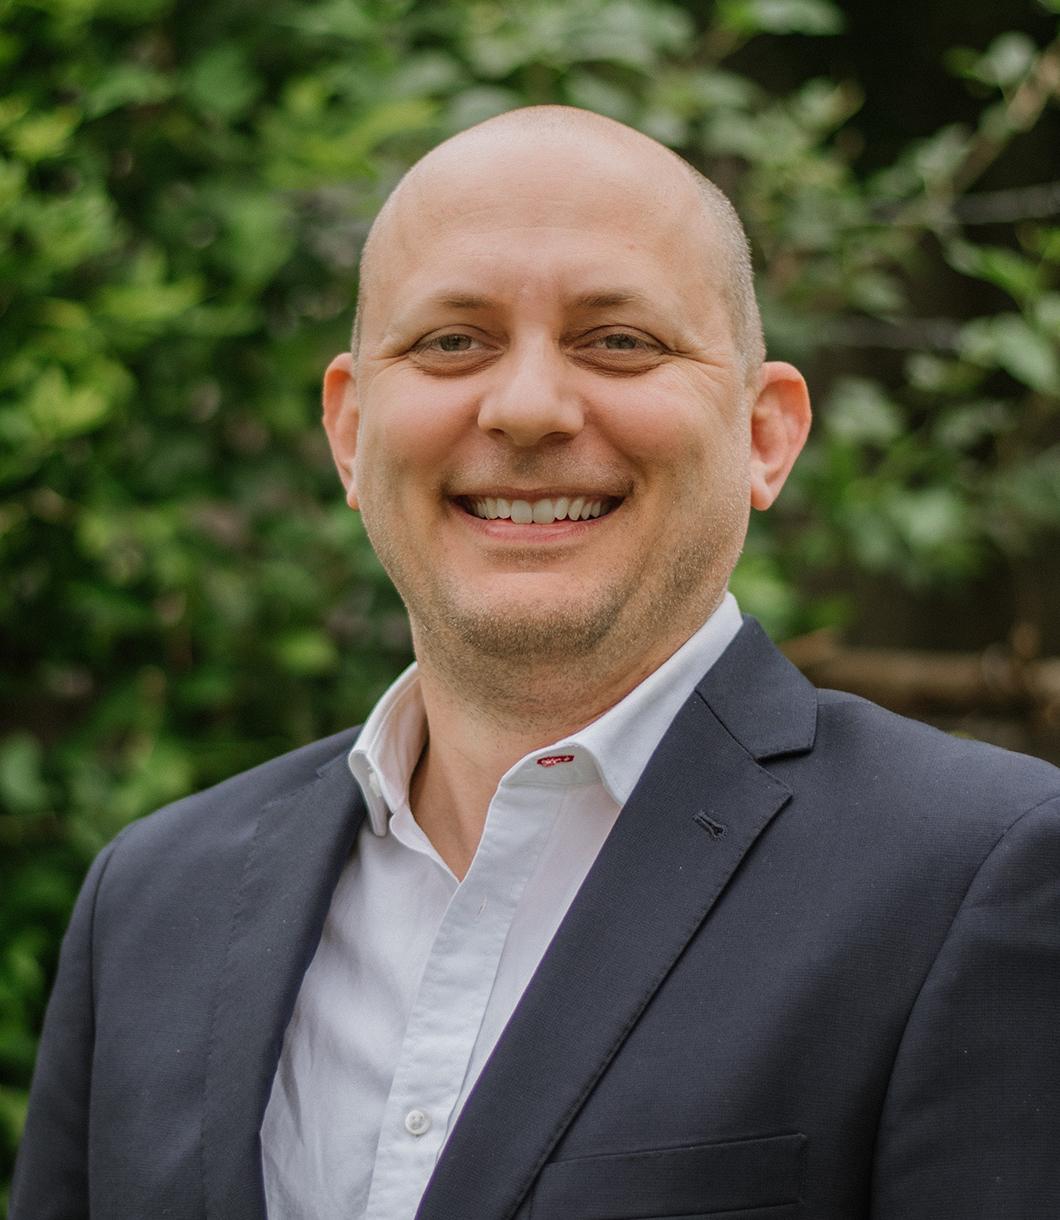 Derek Mroz - Agent at The Reyna Group